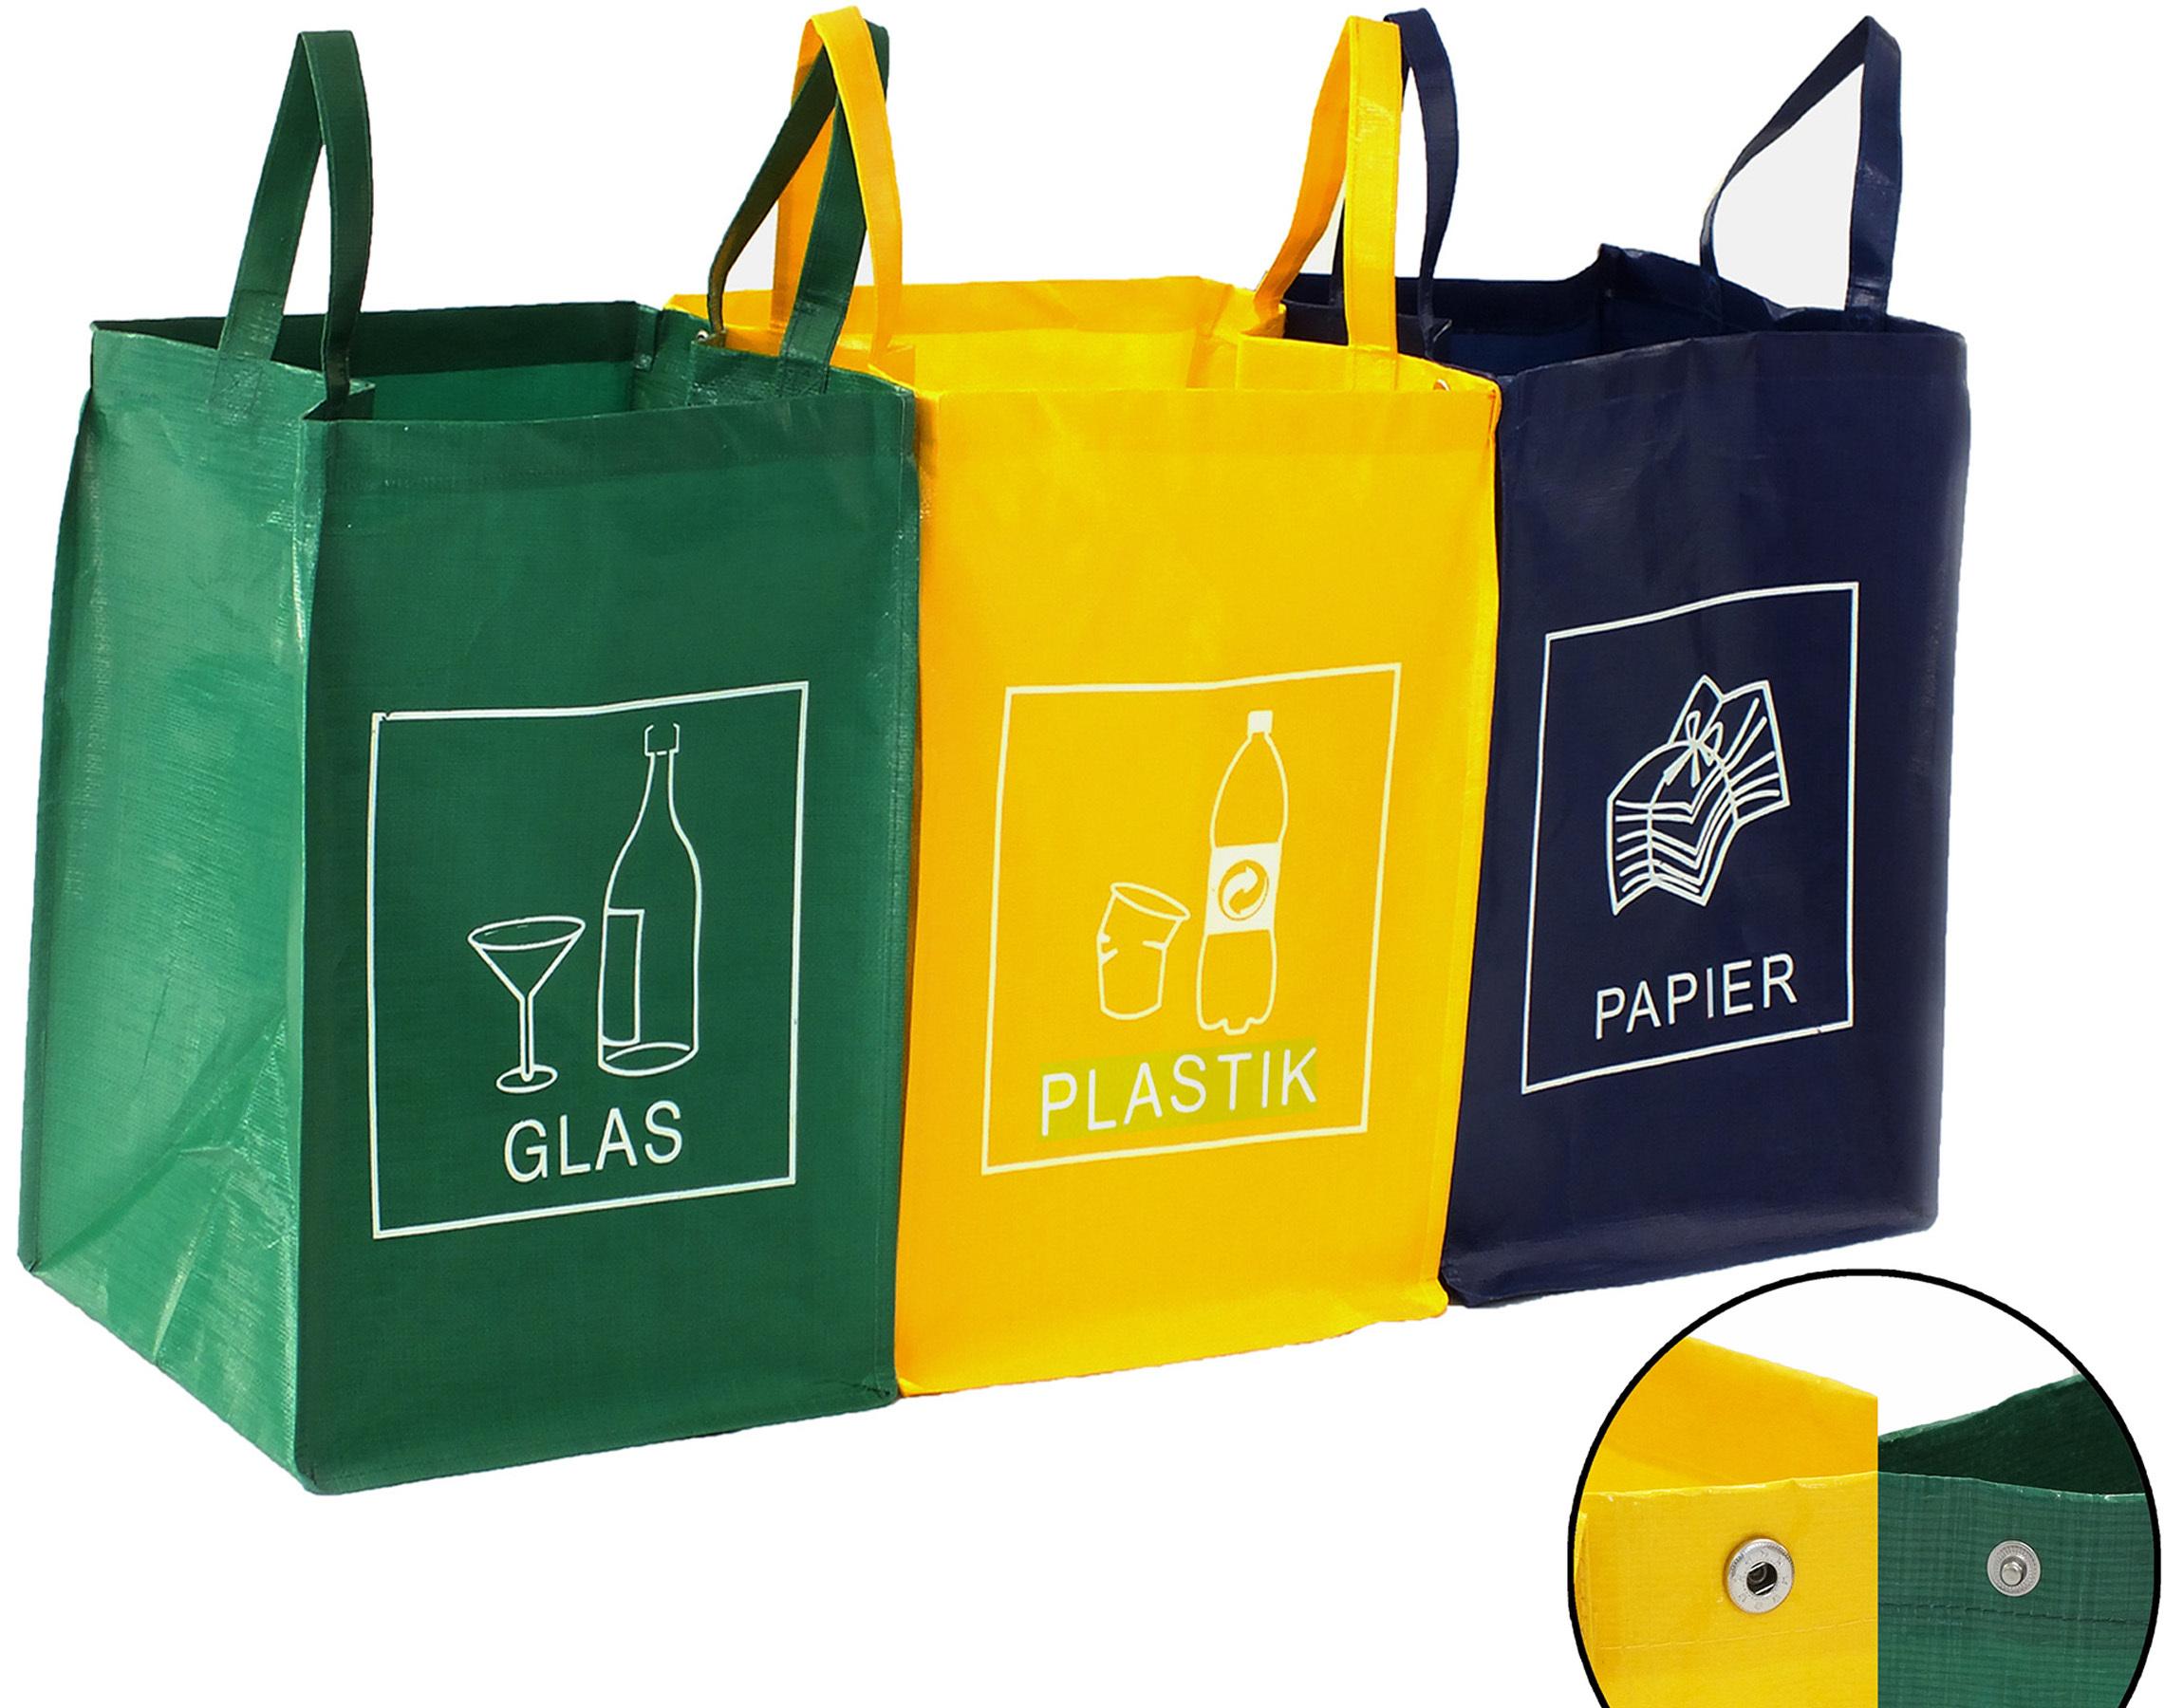 Plastik Mülleimer